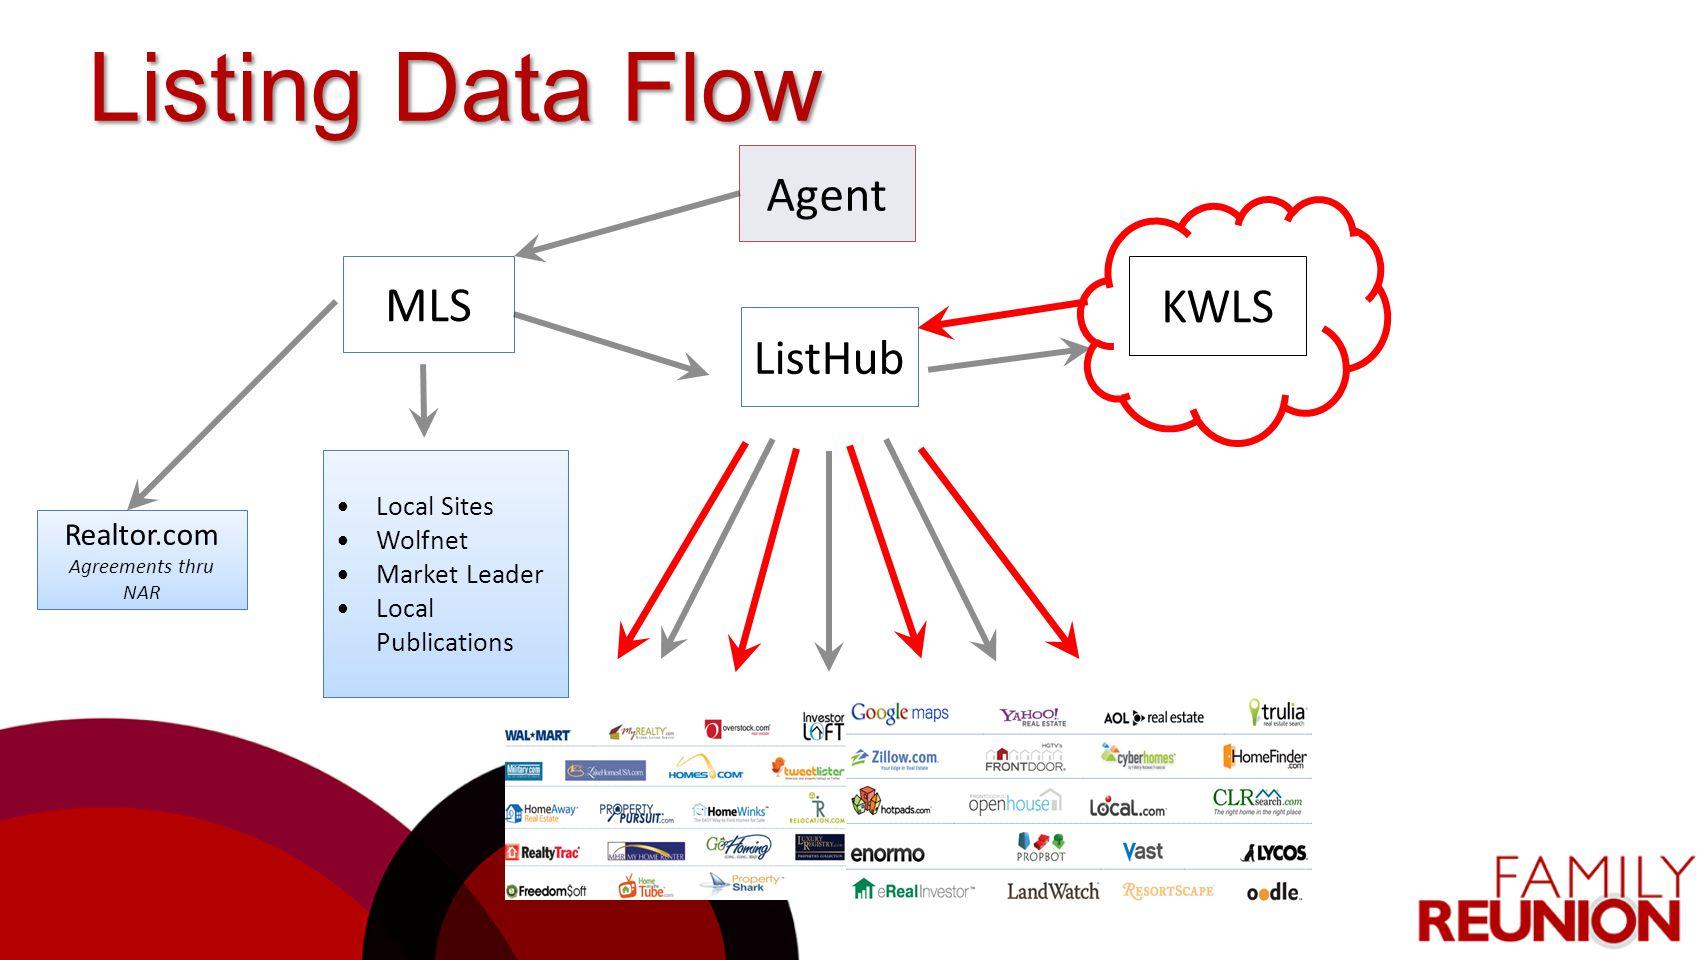 Listing Data Flow Agent KWLS MLS ListHub Realtor.com Local Sites